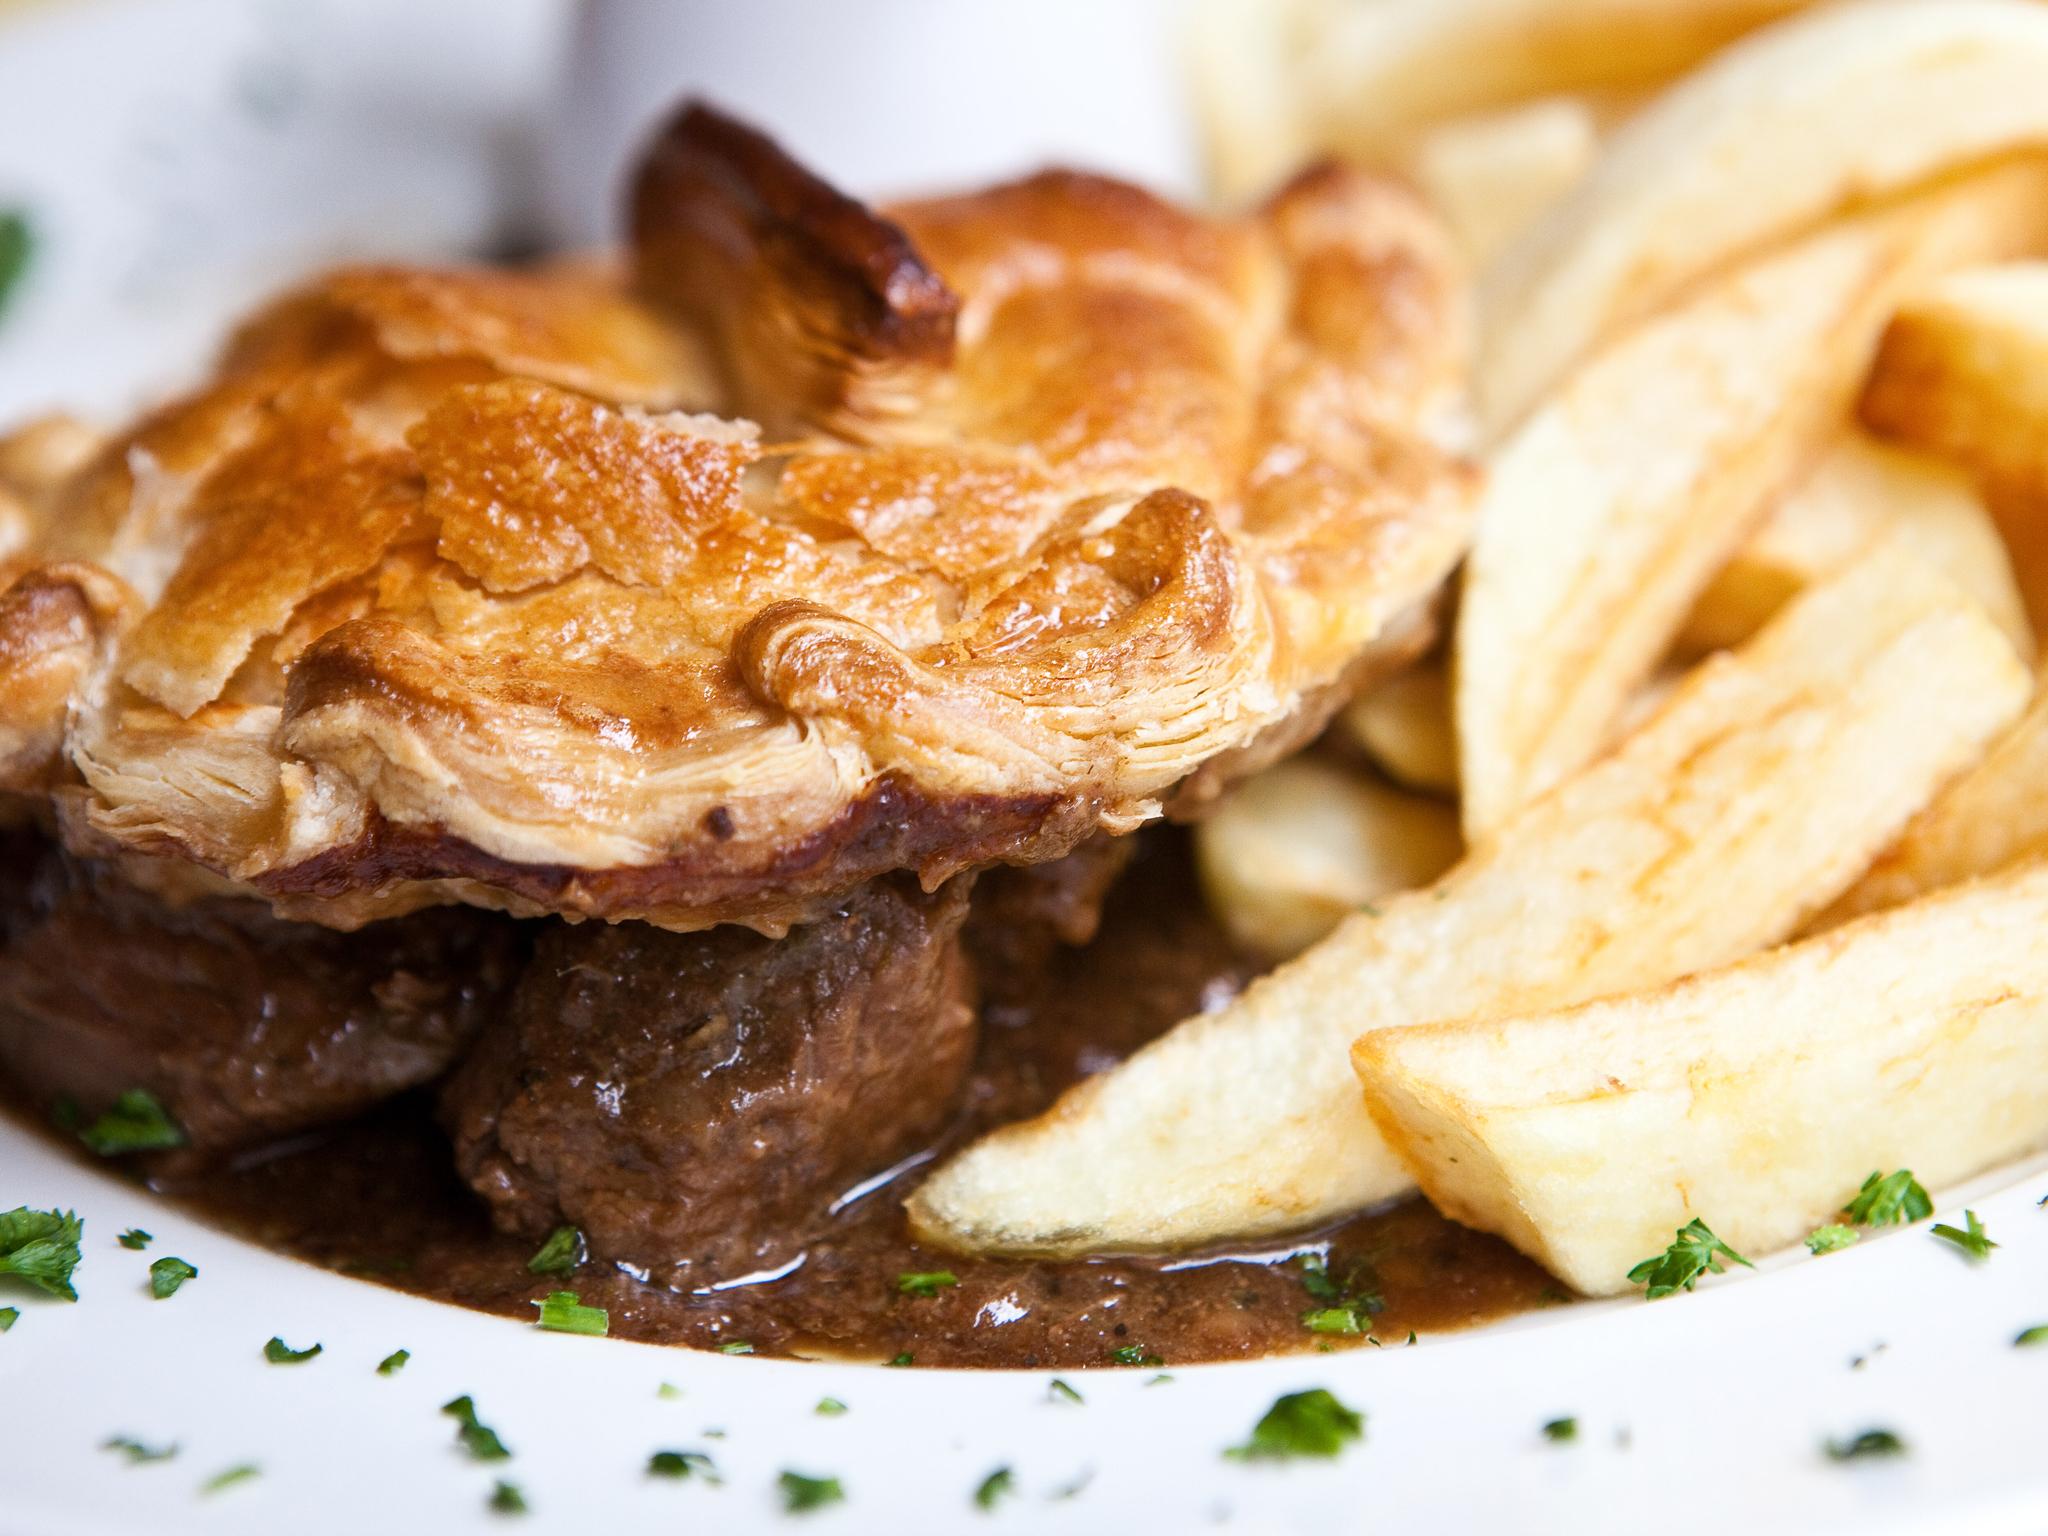 Golden Union Fish Bar steak and ale pie